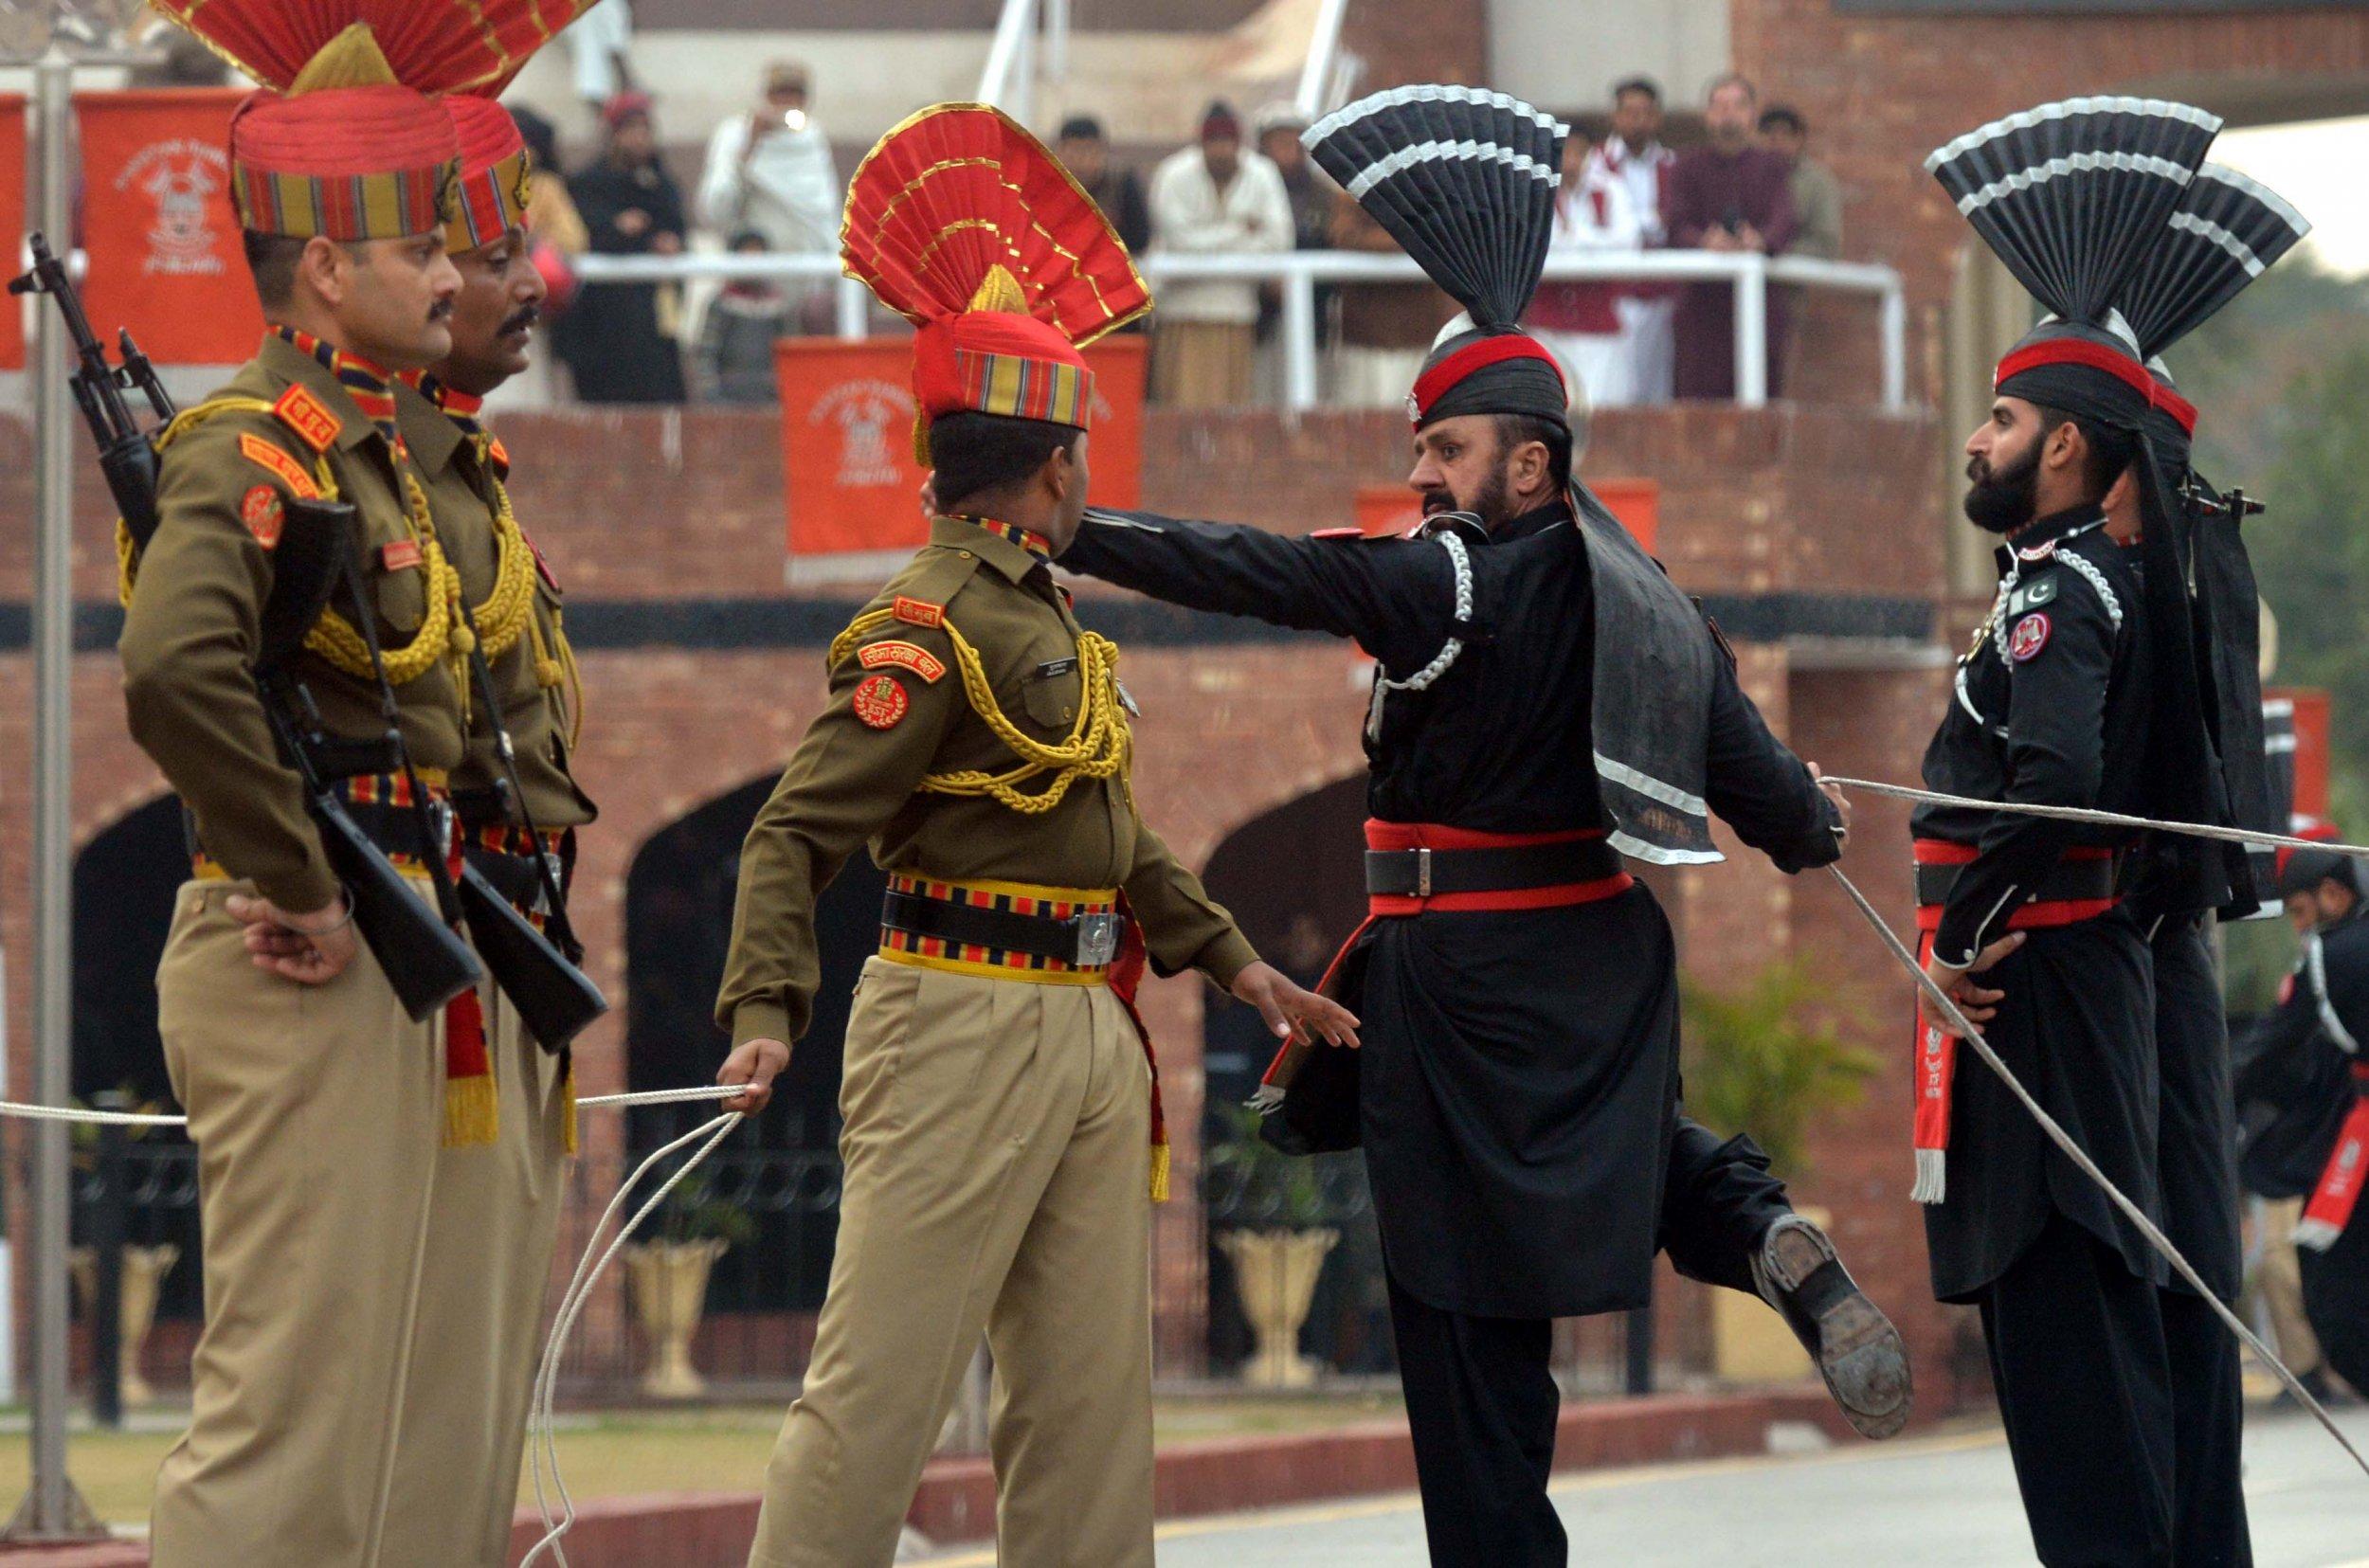 India, Pakistan, border, conflict, war, troops